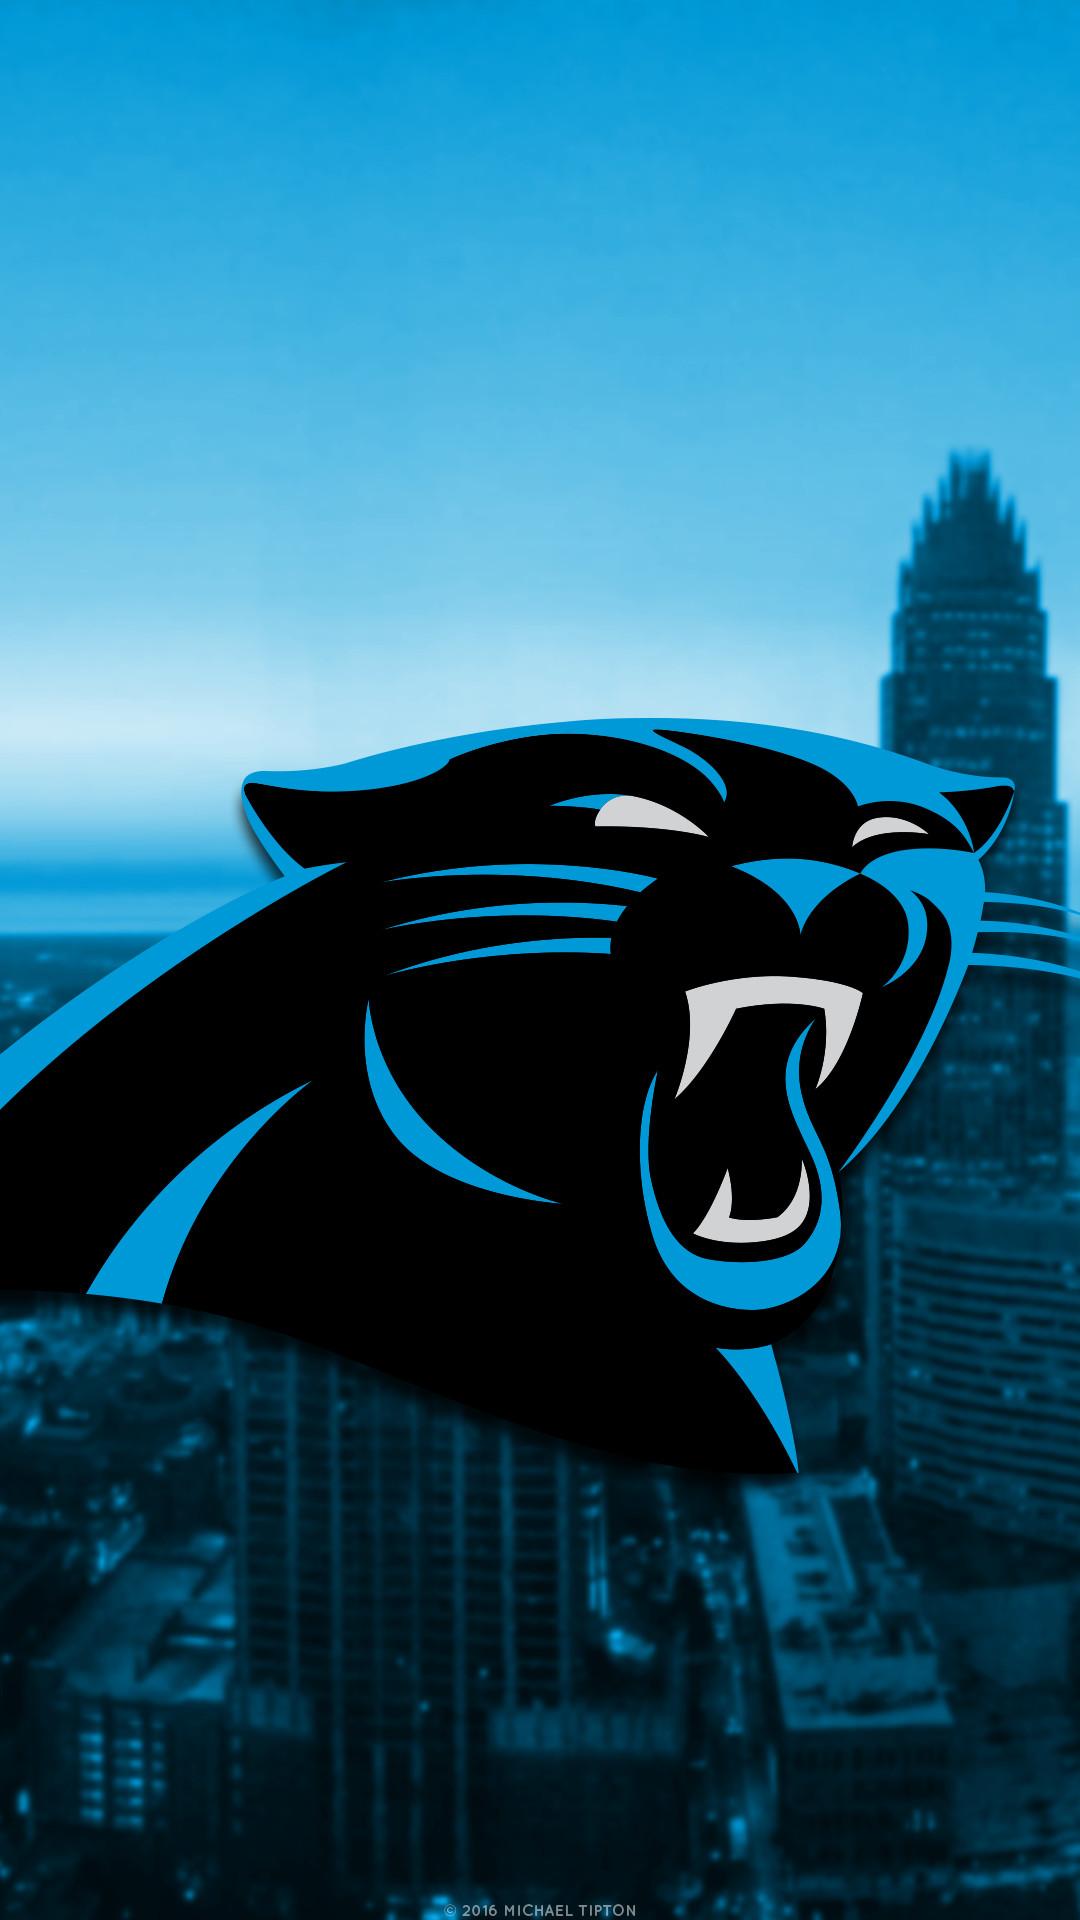 … galaxy Carolina Panthers city 2017 logo wallpaper free iphone 5, 6, 7,  galaxy s6